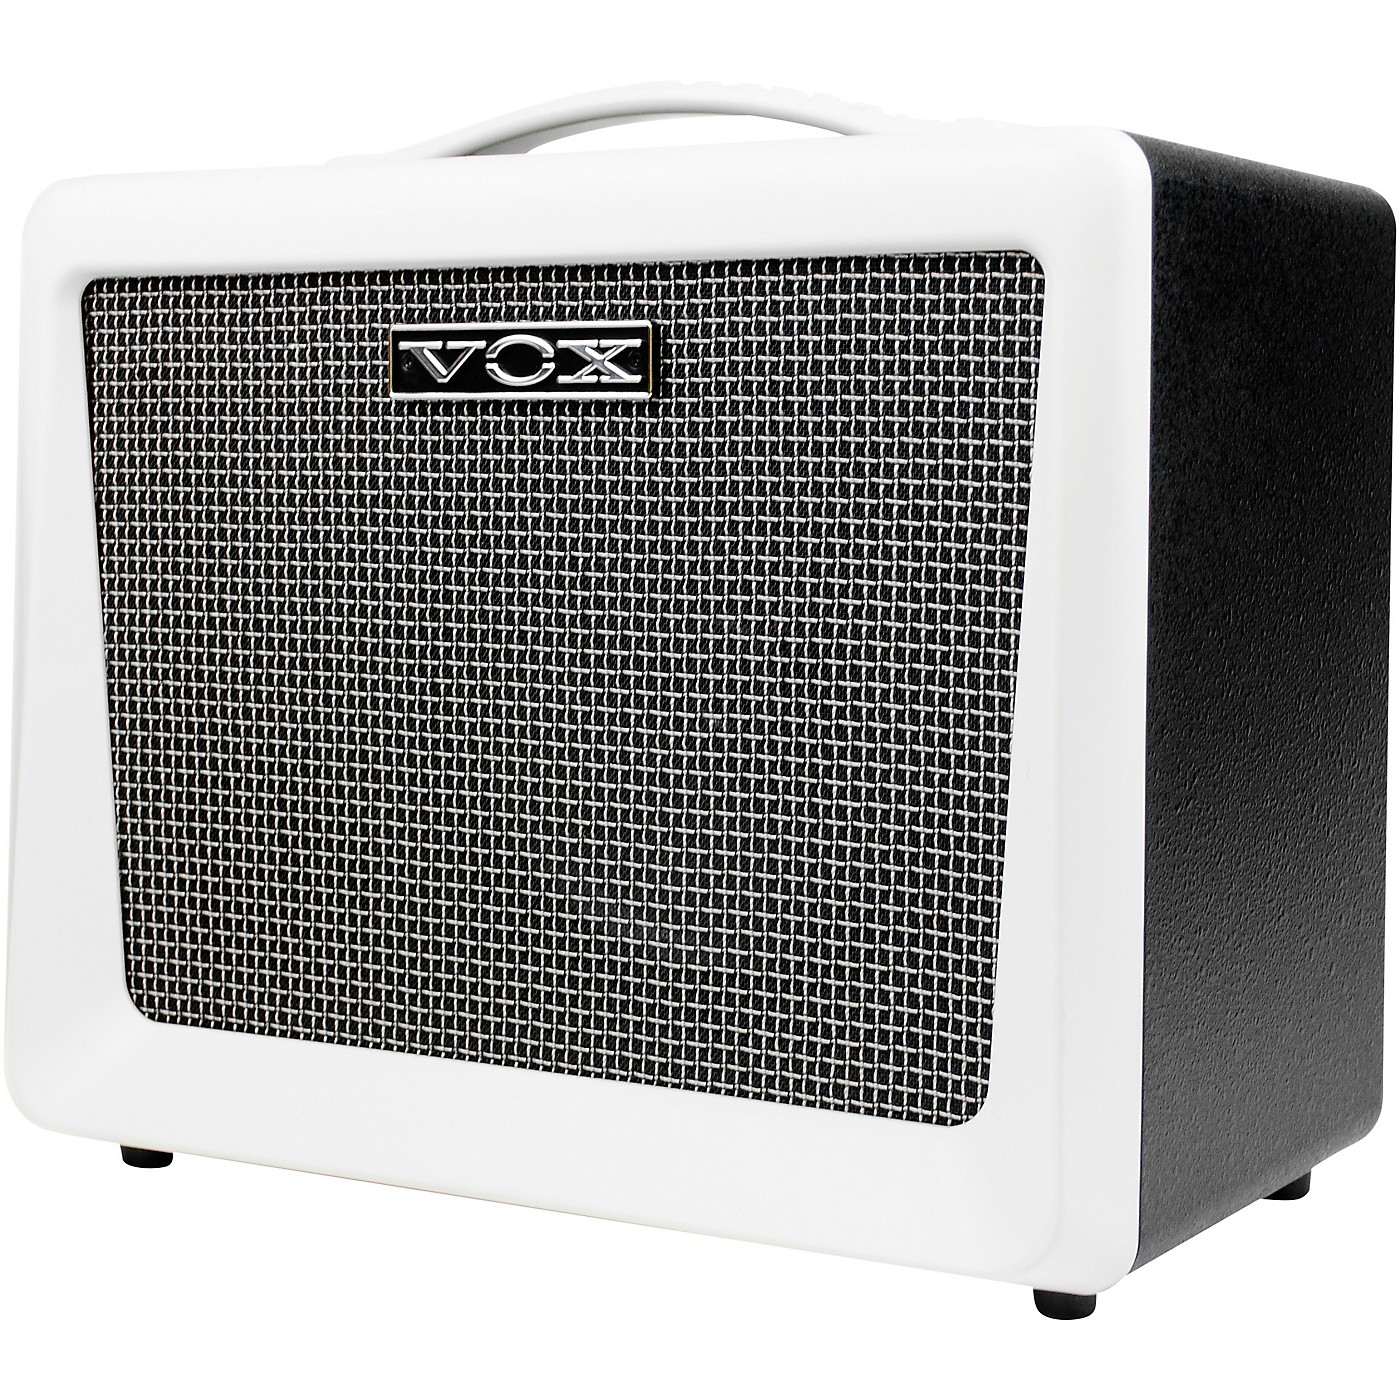 Vox 50 Watt Keyboard amp W/Nutube thumbnail